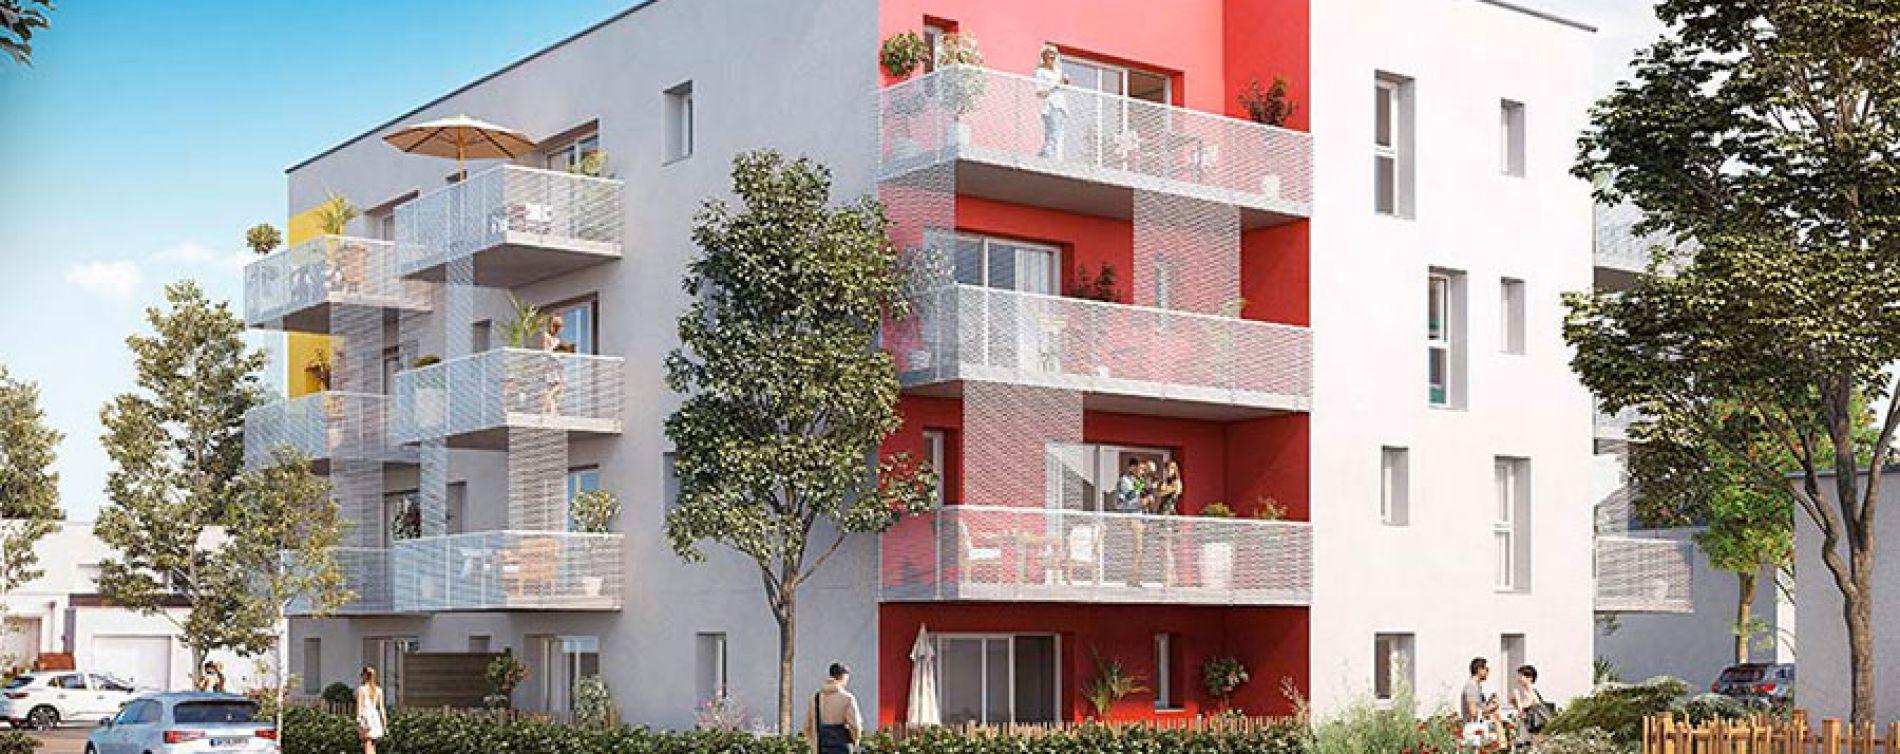 L 39 envol e saint barth lemy d 39 anjou programme immobilier for Les 5 jardins saint barthelemy d anjou